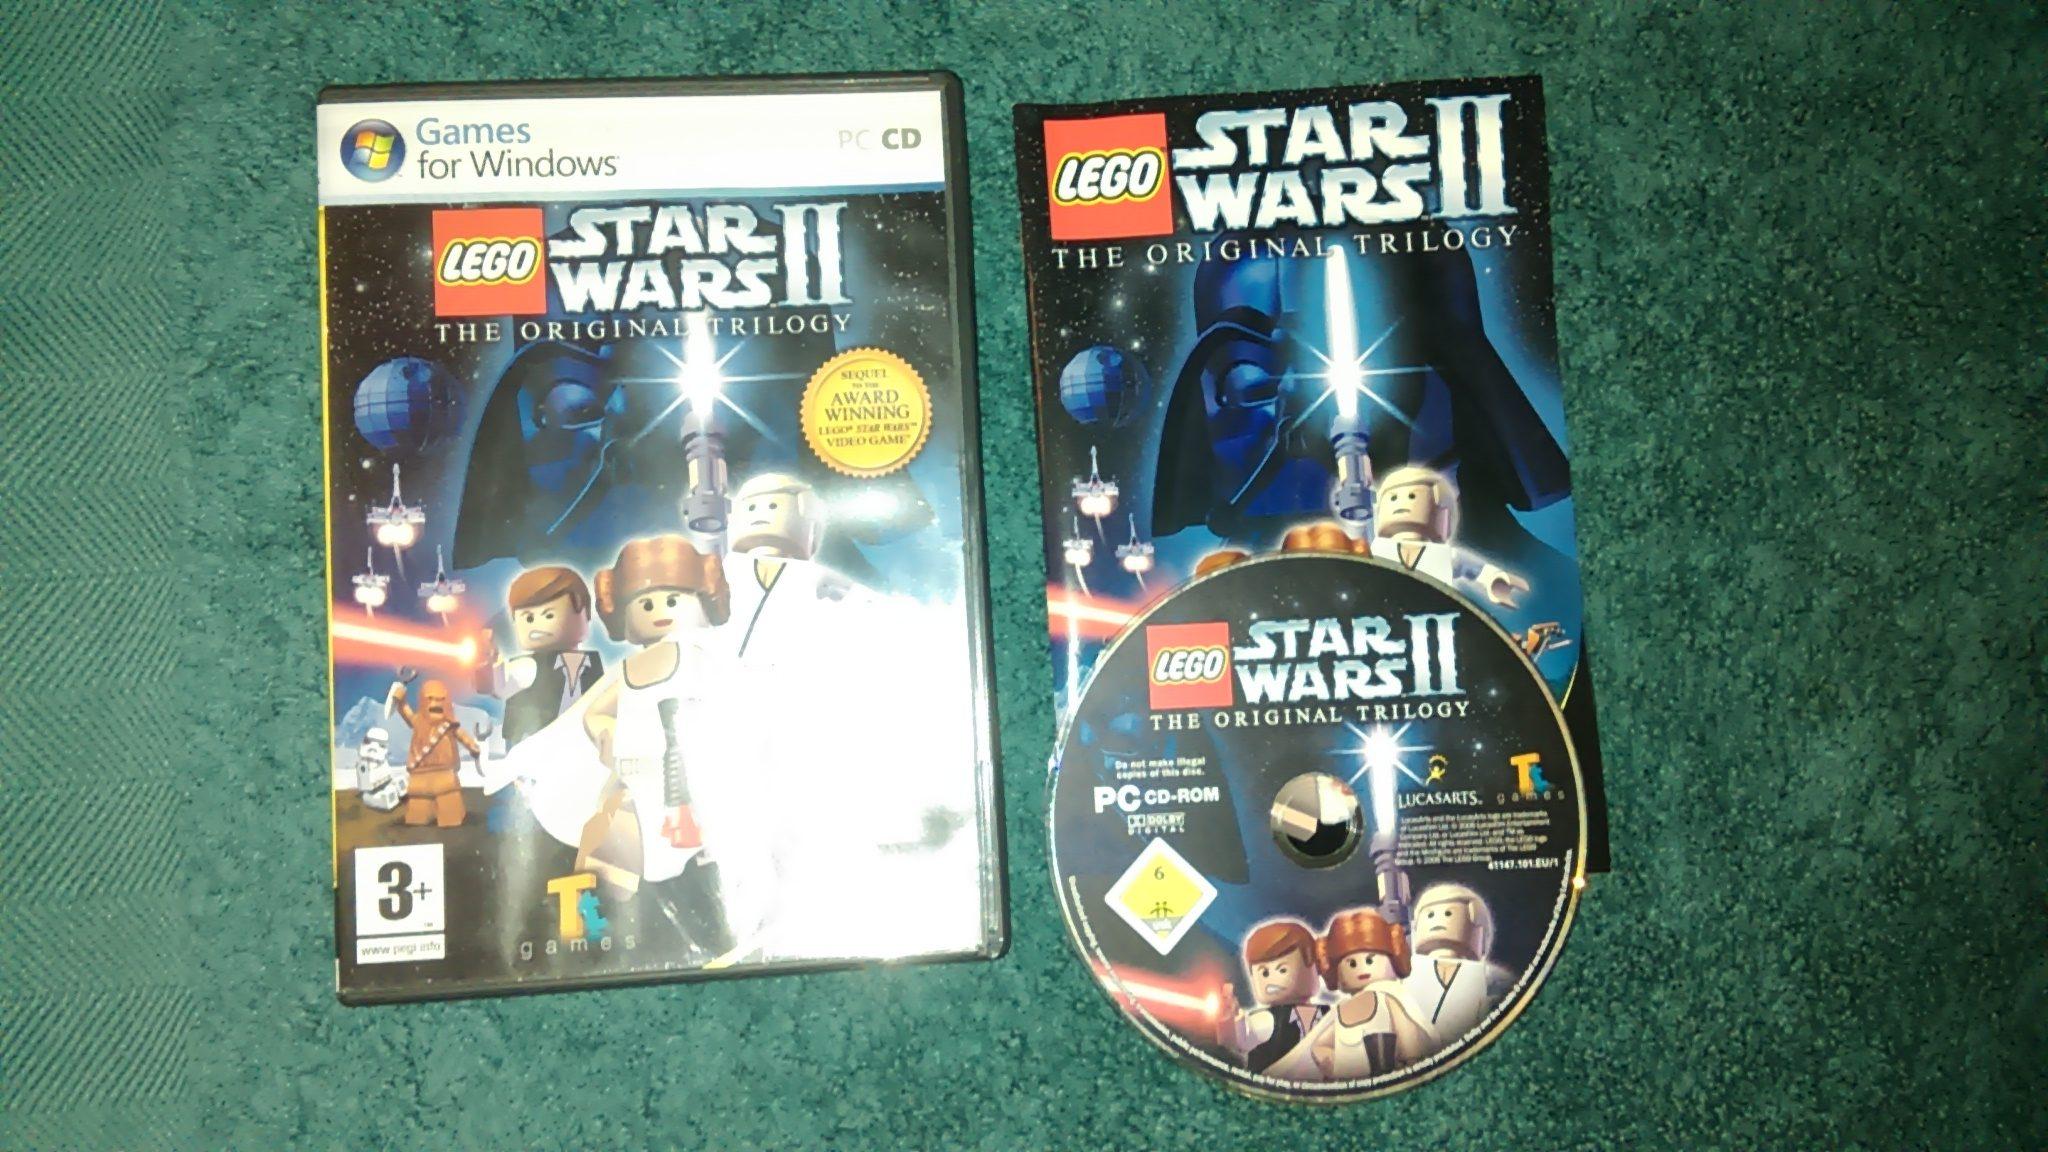 Lego Star Wars Ii The Original Trilogy Curios And Wonders